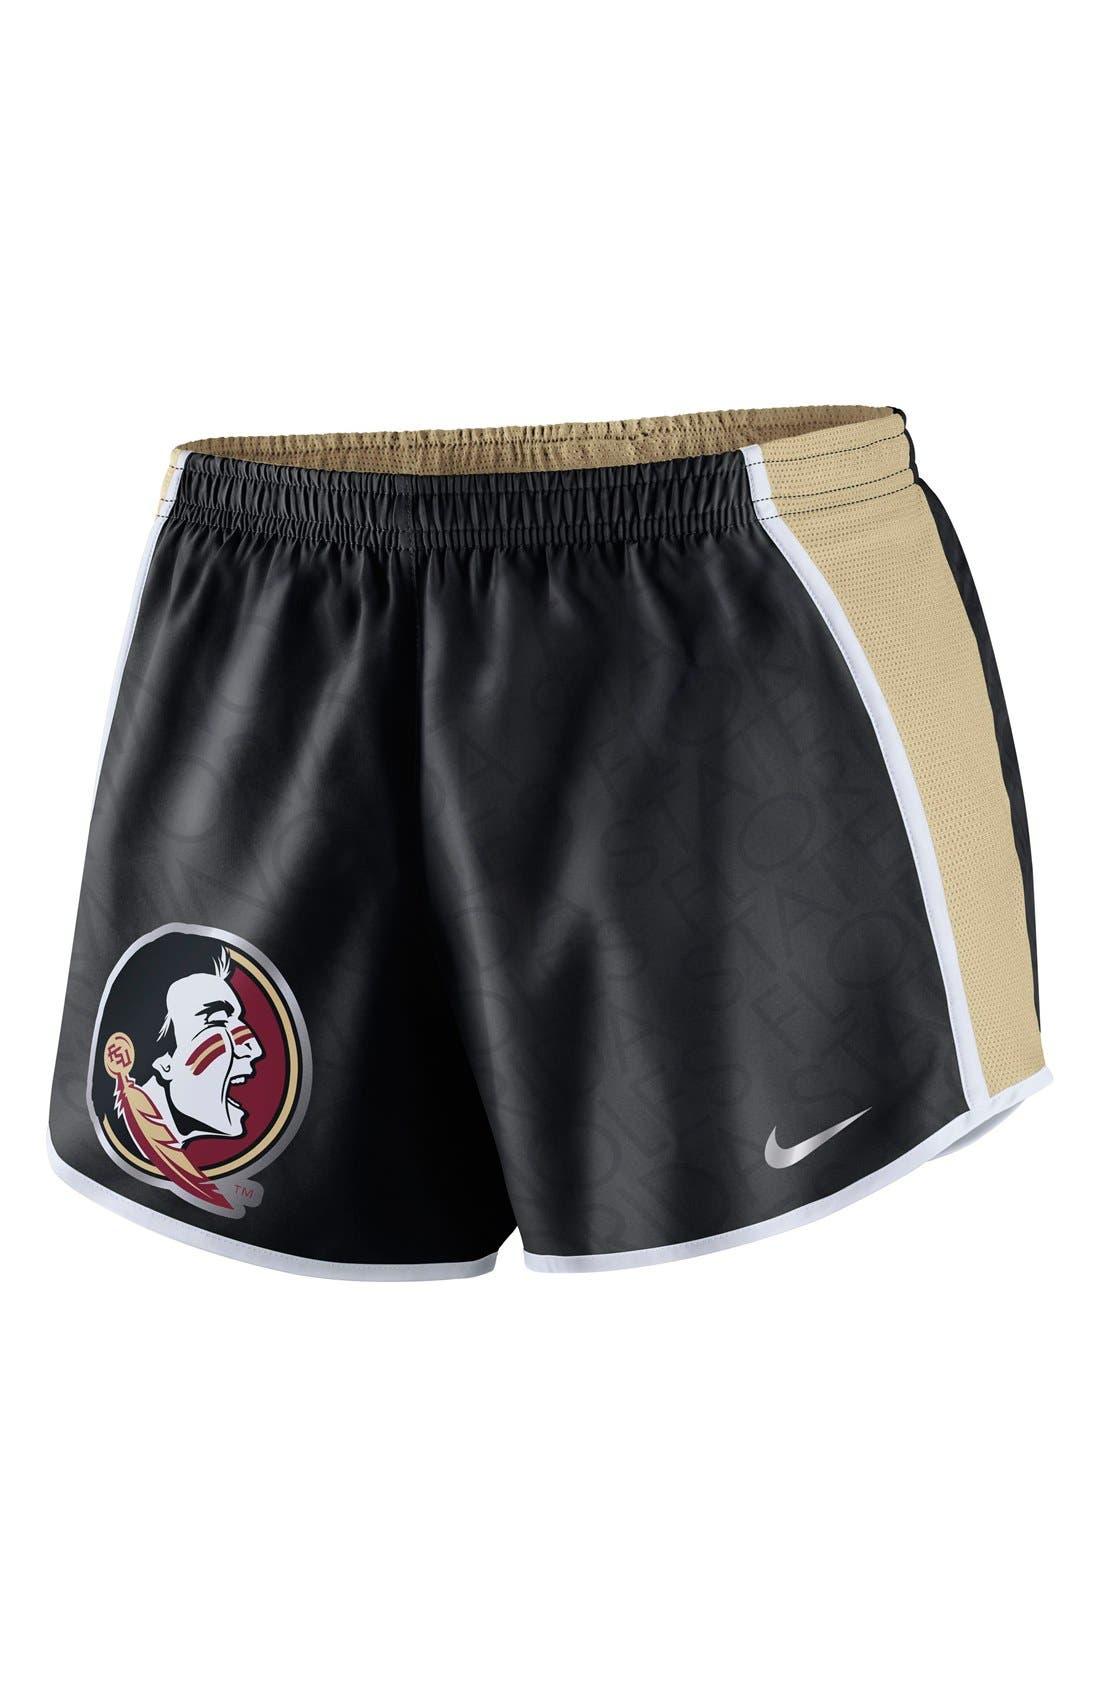 Alternate Image 1 Selected - Nike 'Champ Drive - Florida State University' Logo Dri-FIT Shorts